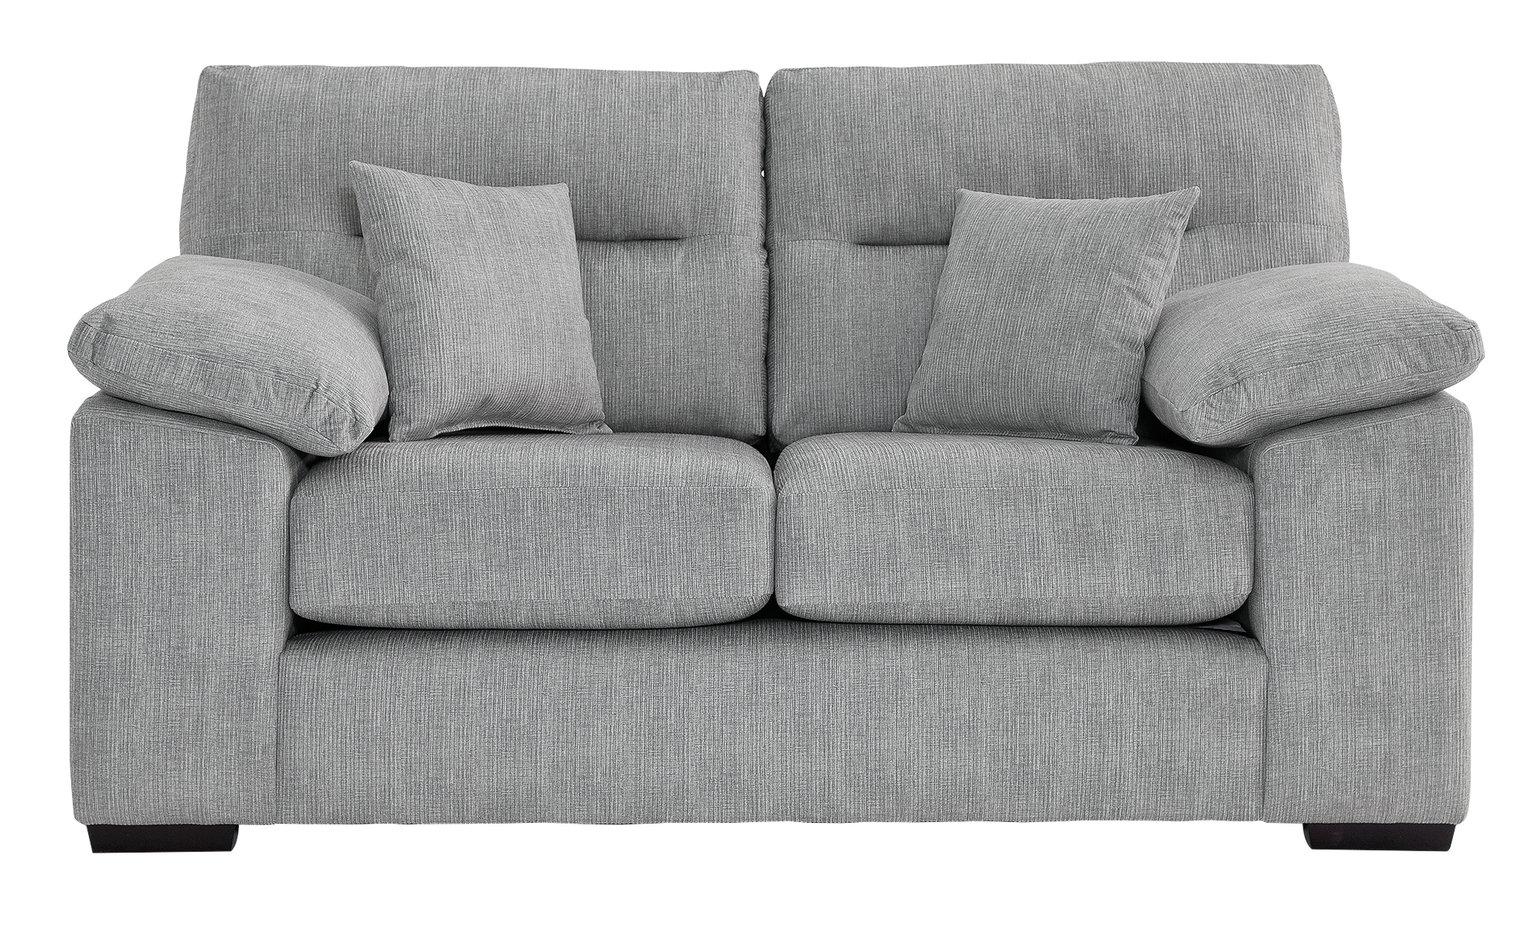 Argos Home Donavan 2 Seater Fabric Sofa - Silver